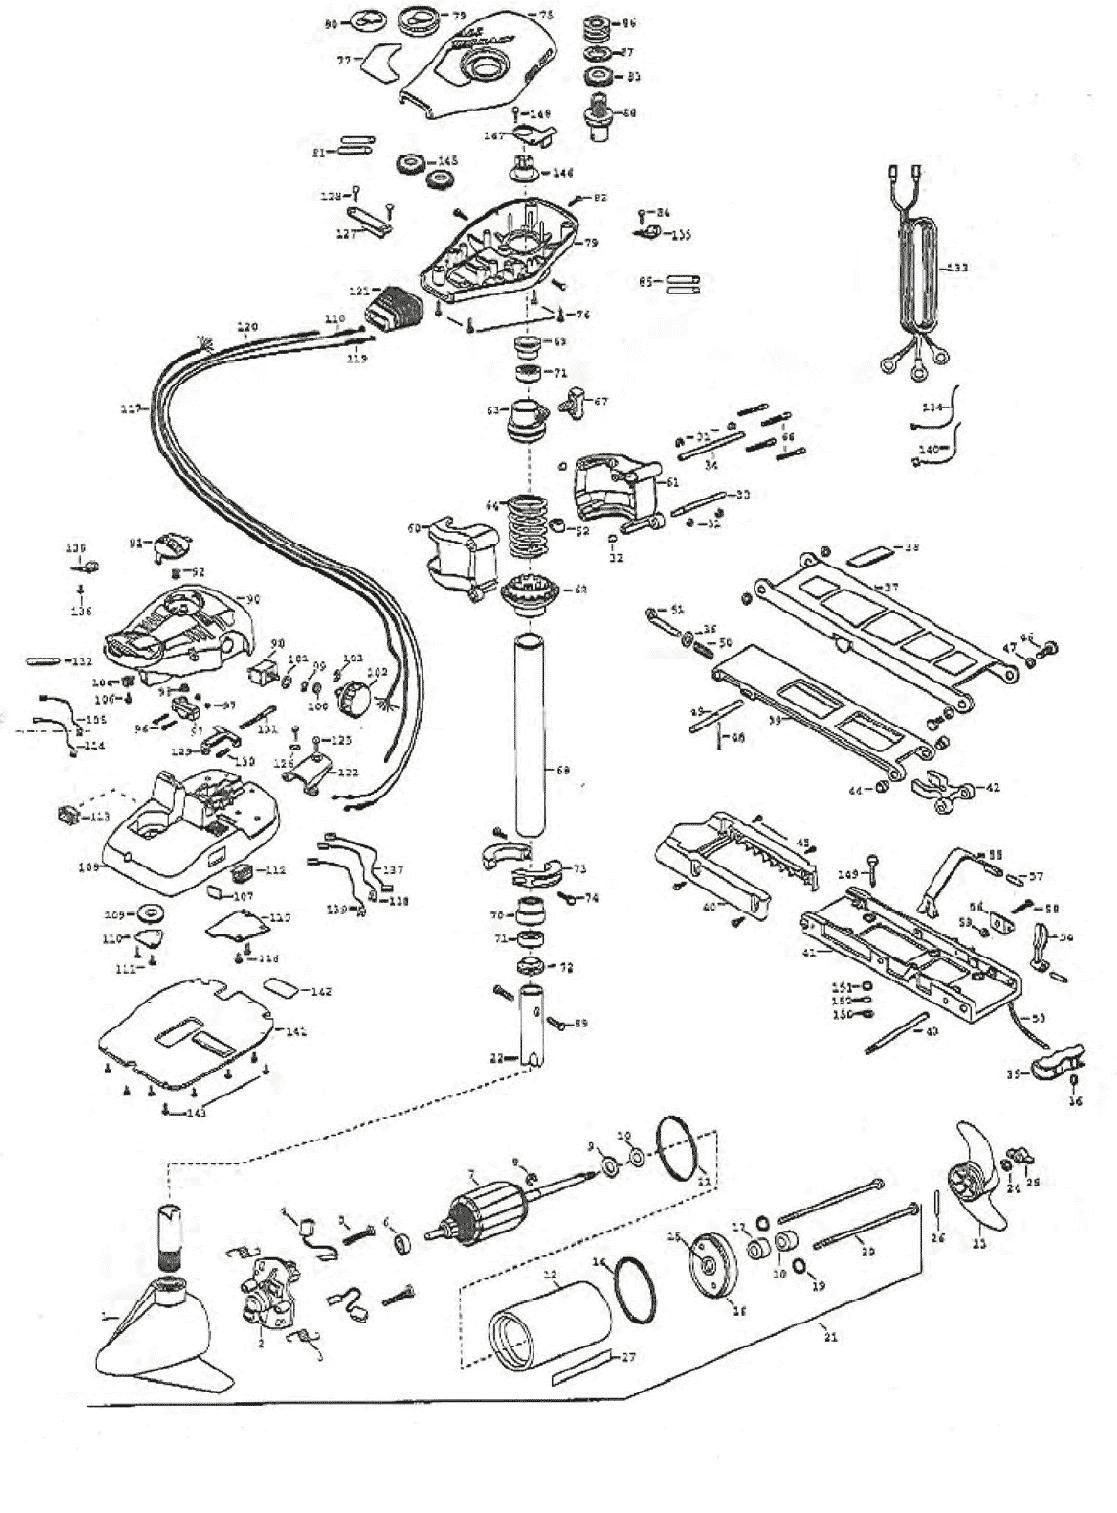 hight resolution of minn kota edge wiring diagram wiring diagramminn kota 65 wiring diagram best wiring libraryminn kota edge